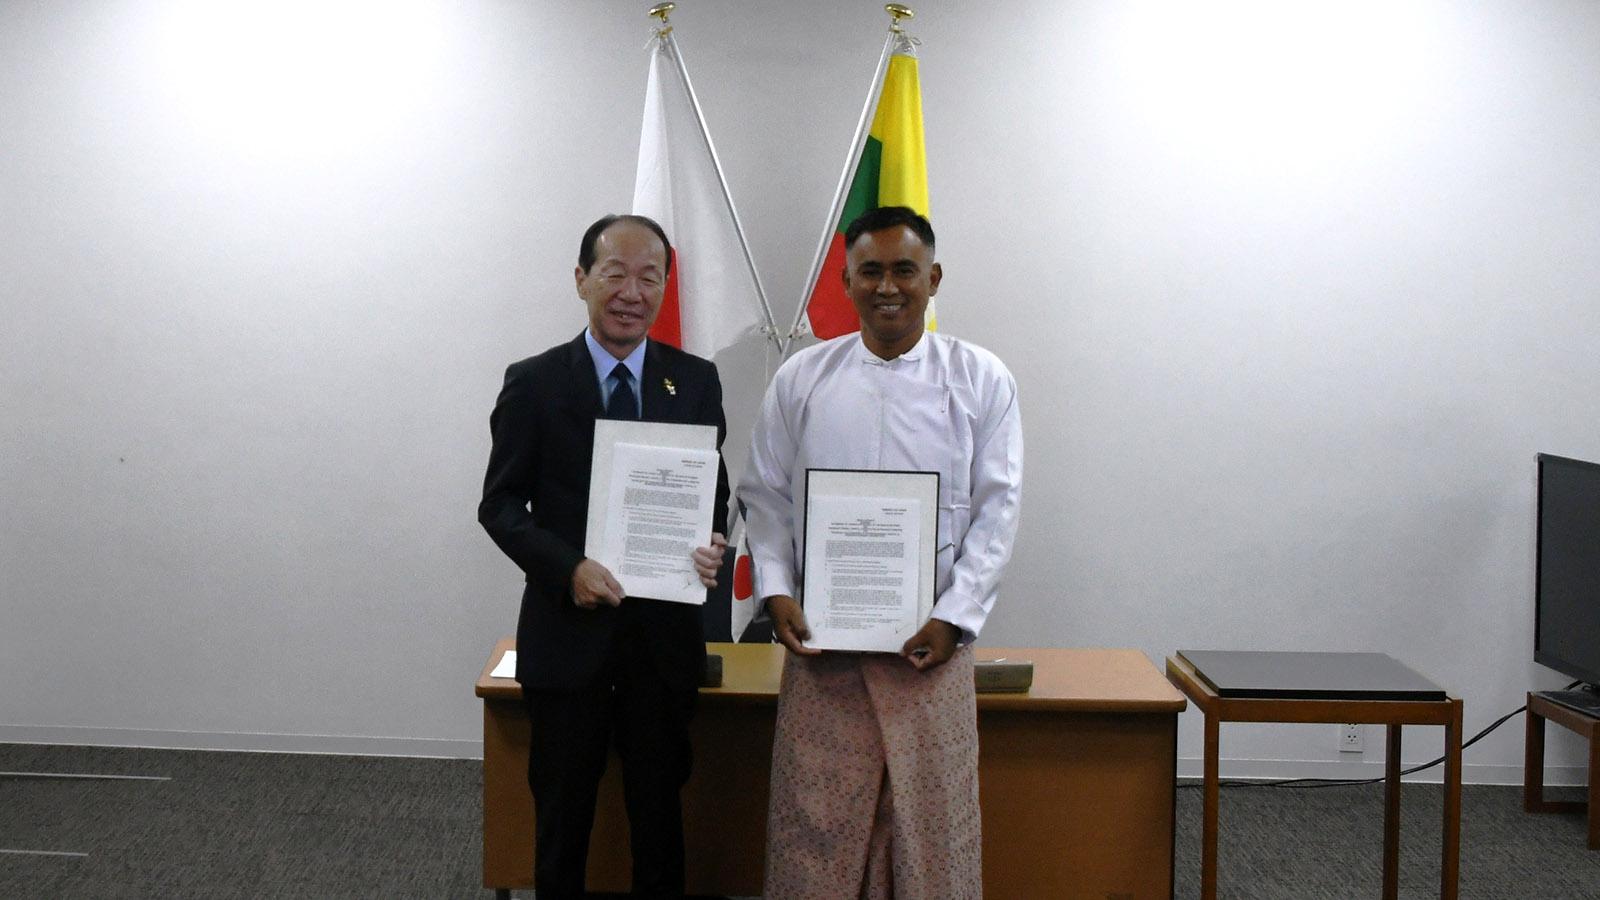 Amb. Mr Maruyama and U Hla Min pose for photo after signing the project on upgrading Maungtaw Hospital.Photo: Phoe Htaung